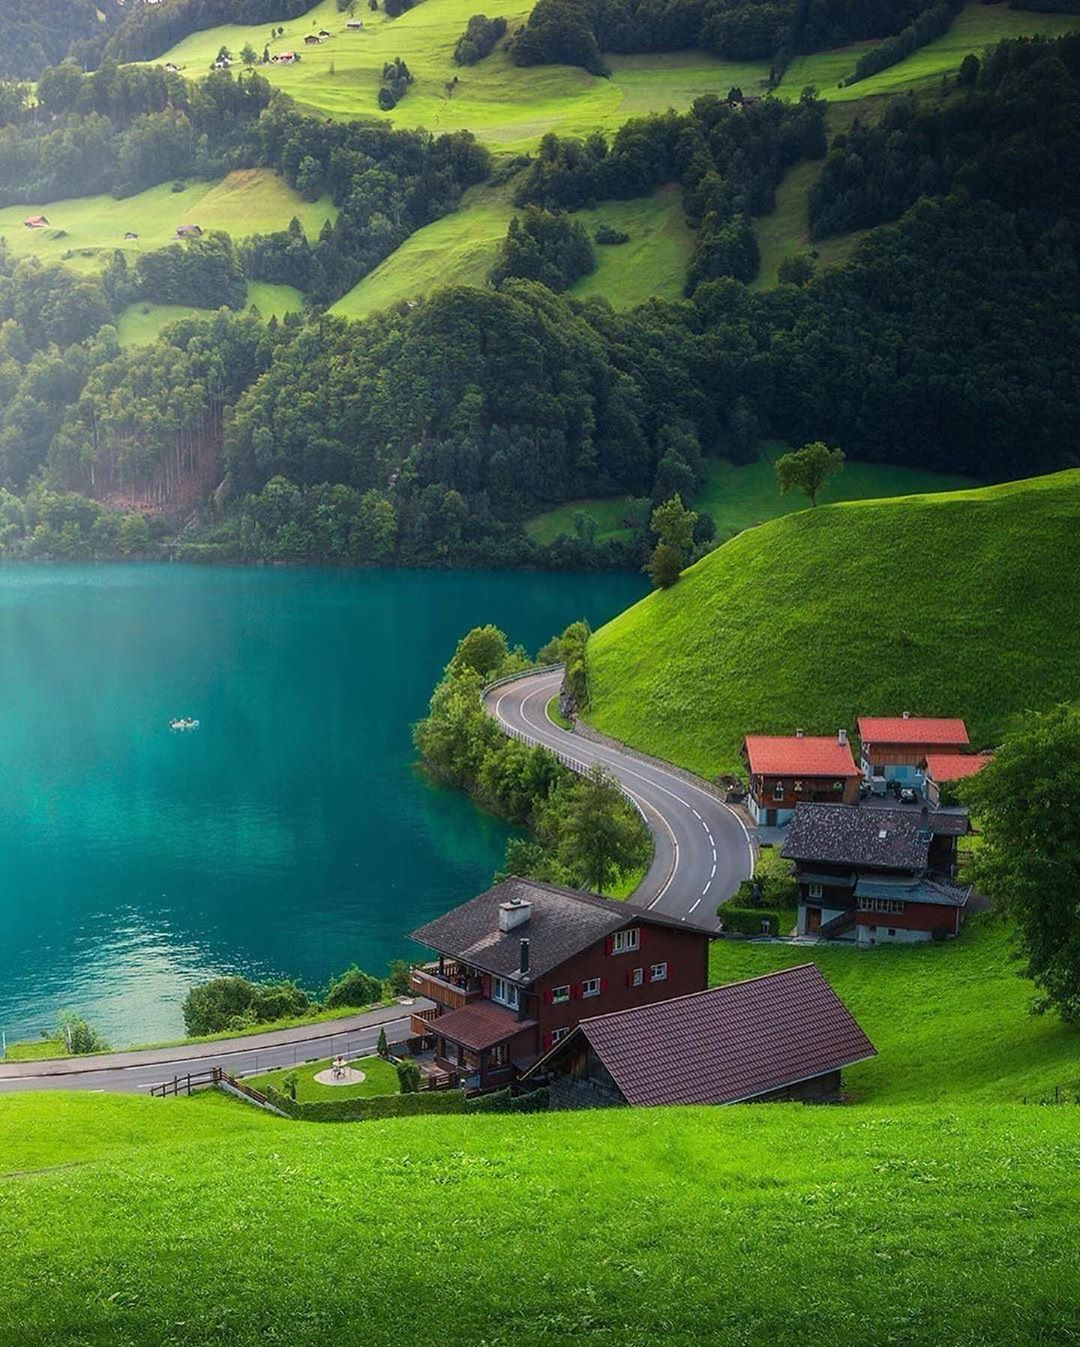 f96bf6bdecd640a1bf0bb21654ad1001?from=pc - 瑞士:一个童话般的国家